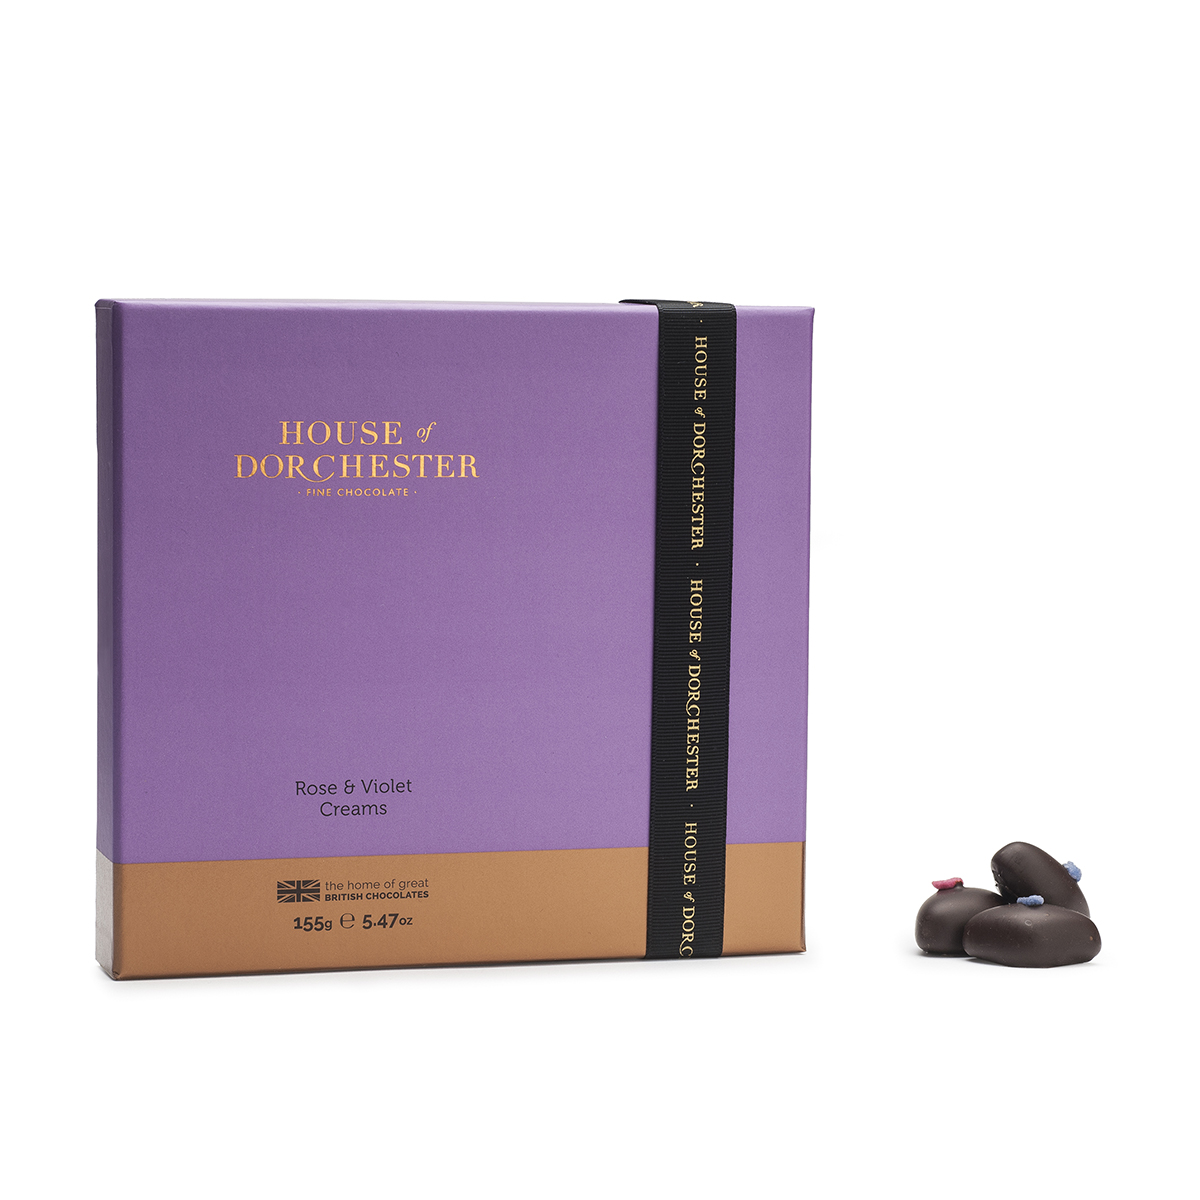 rose & violet creams | house of dorchester